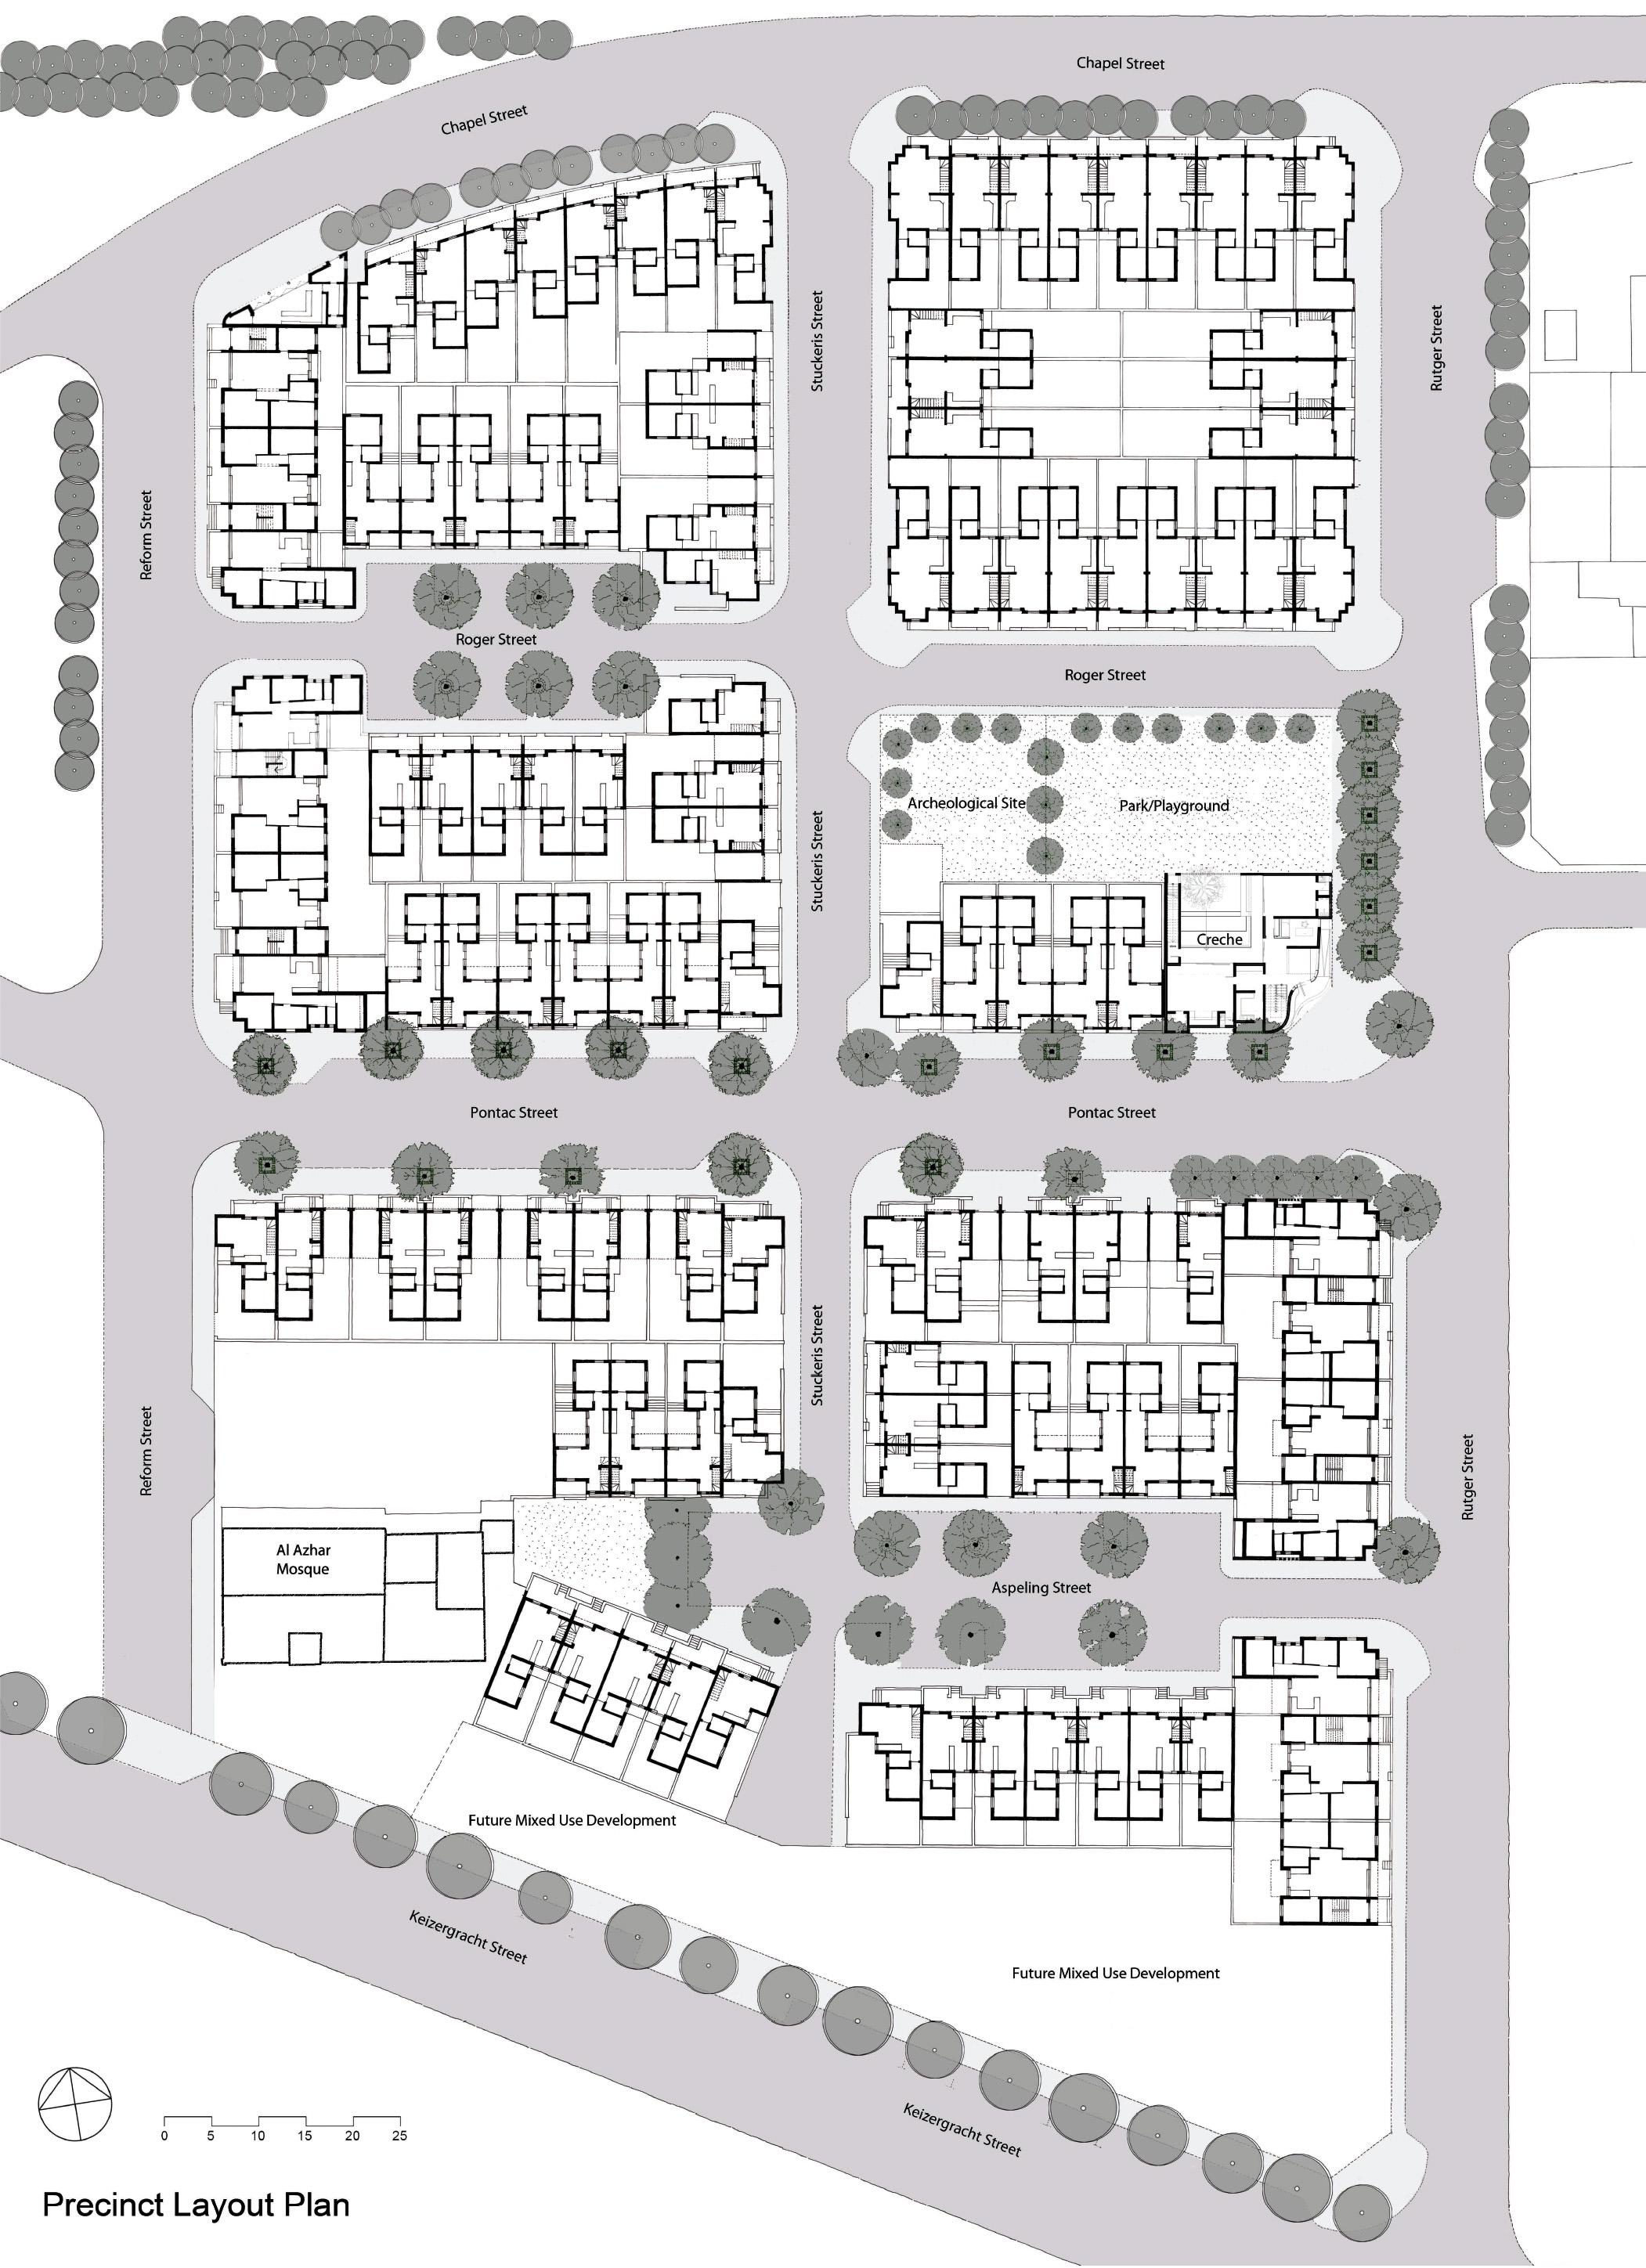 precinct layout plan